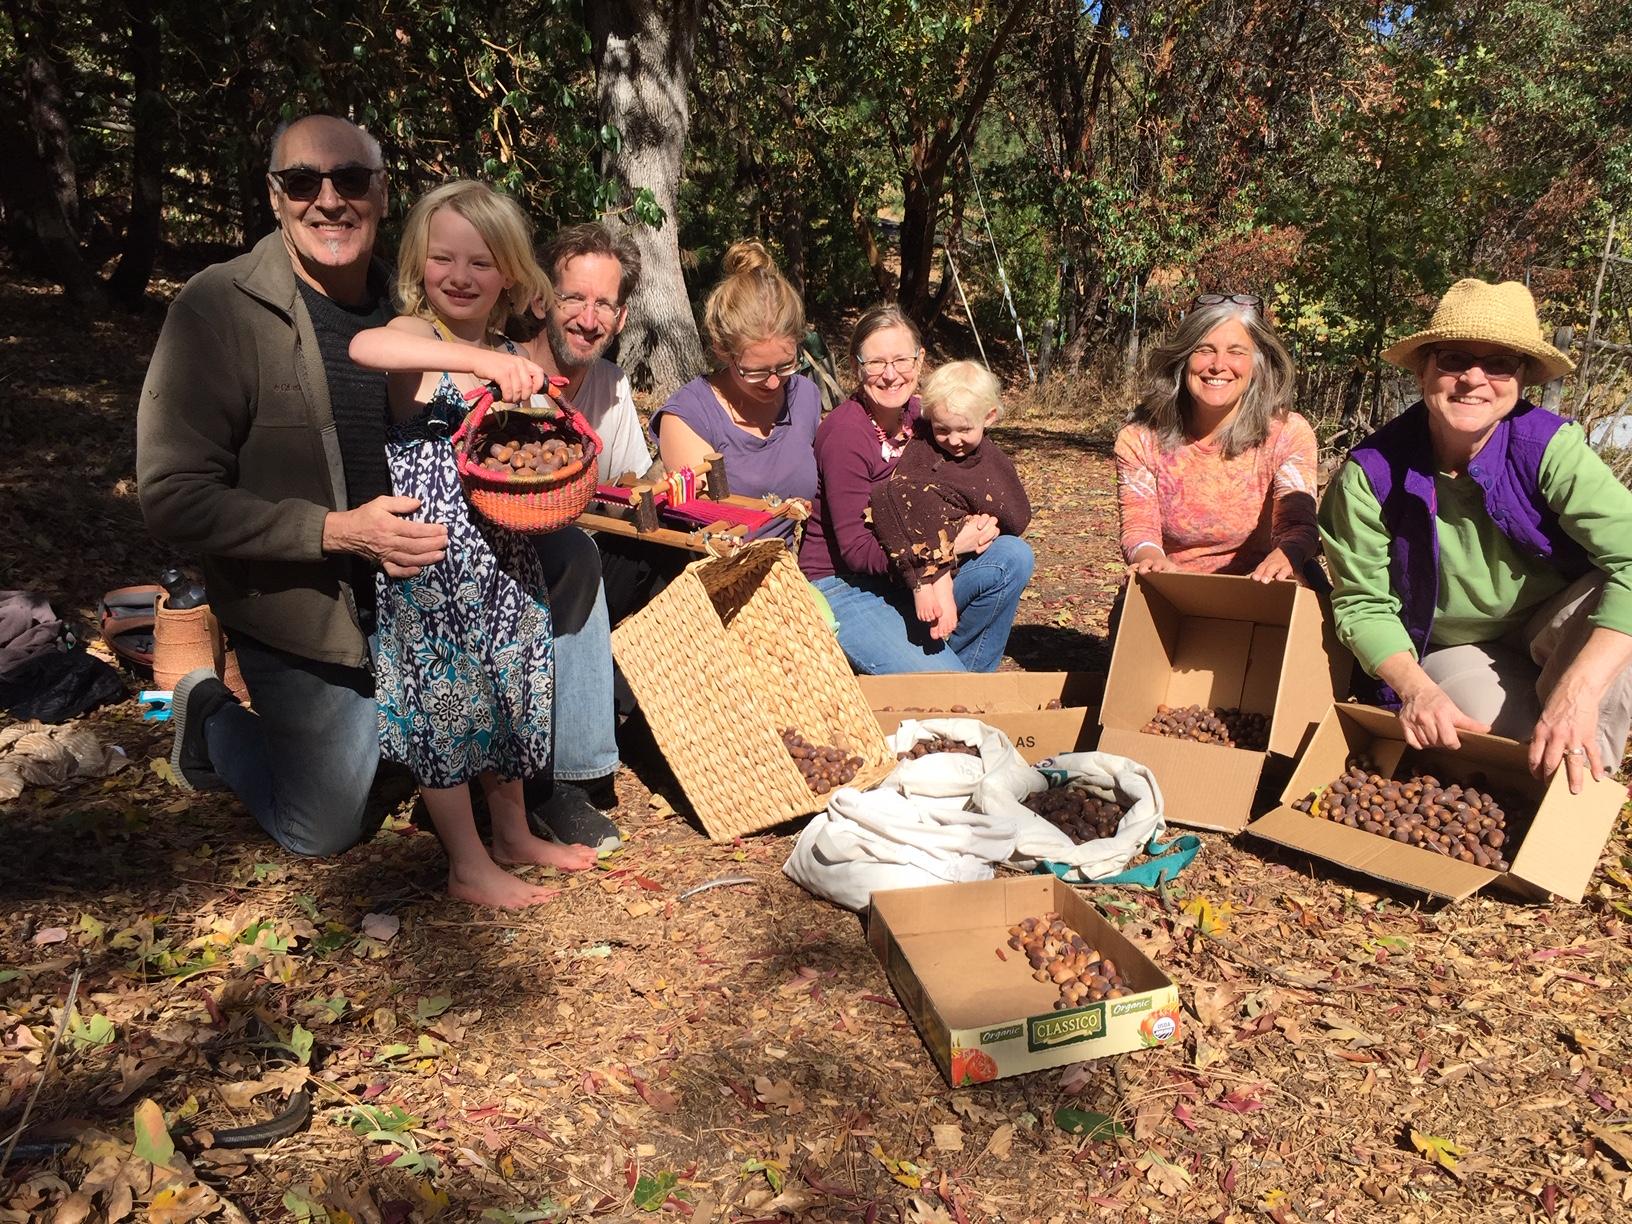 Gathering Acorns - A Community Event